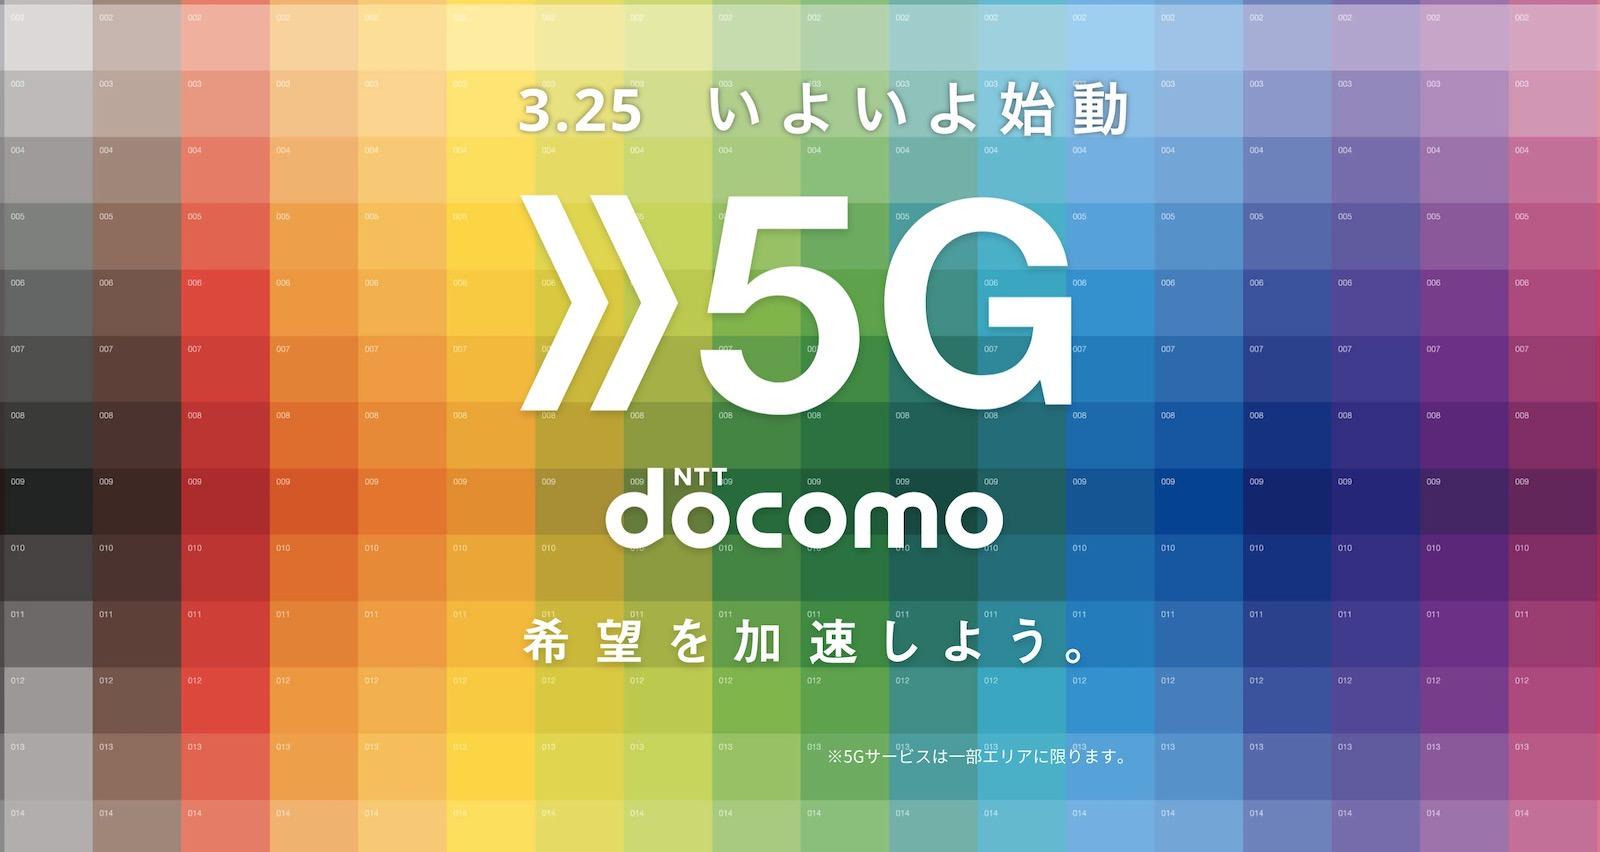 Docomo 5g march 25th